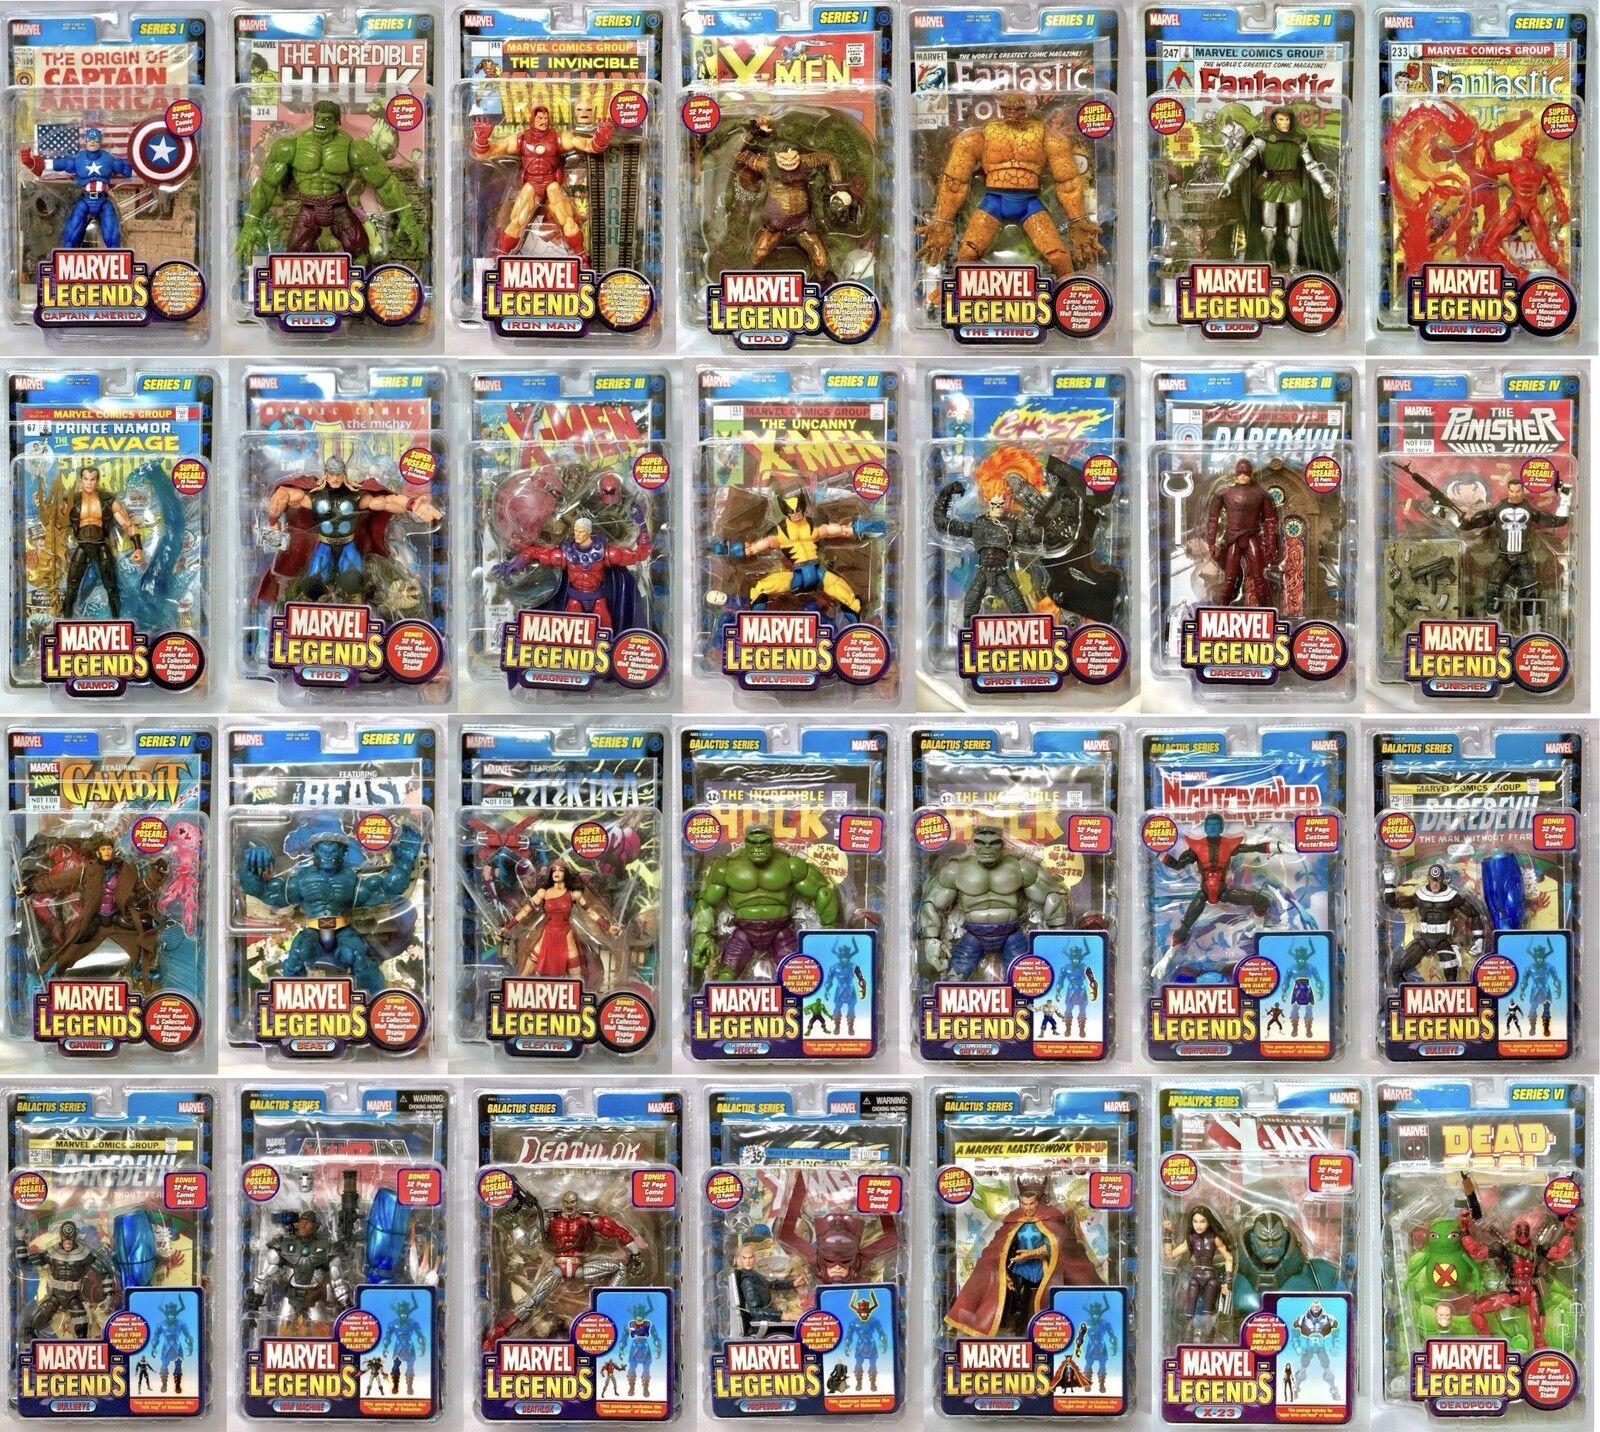 Marvel Legends ToyBiz HUGE LOT Series 1 2 3 4 Galactus NIB Deadpool Iron Man